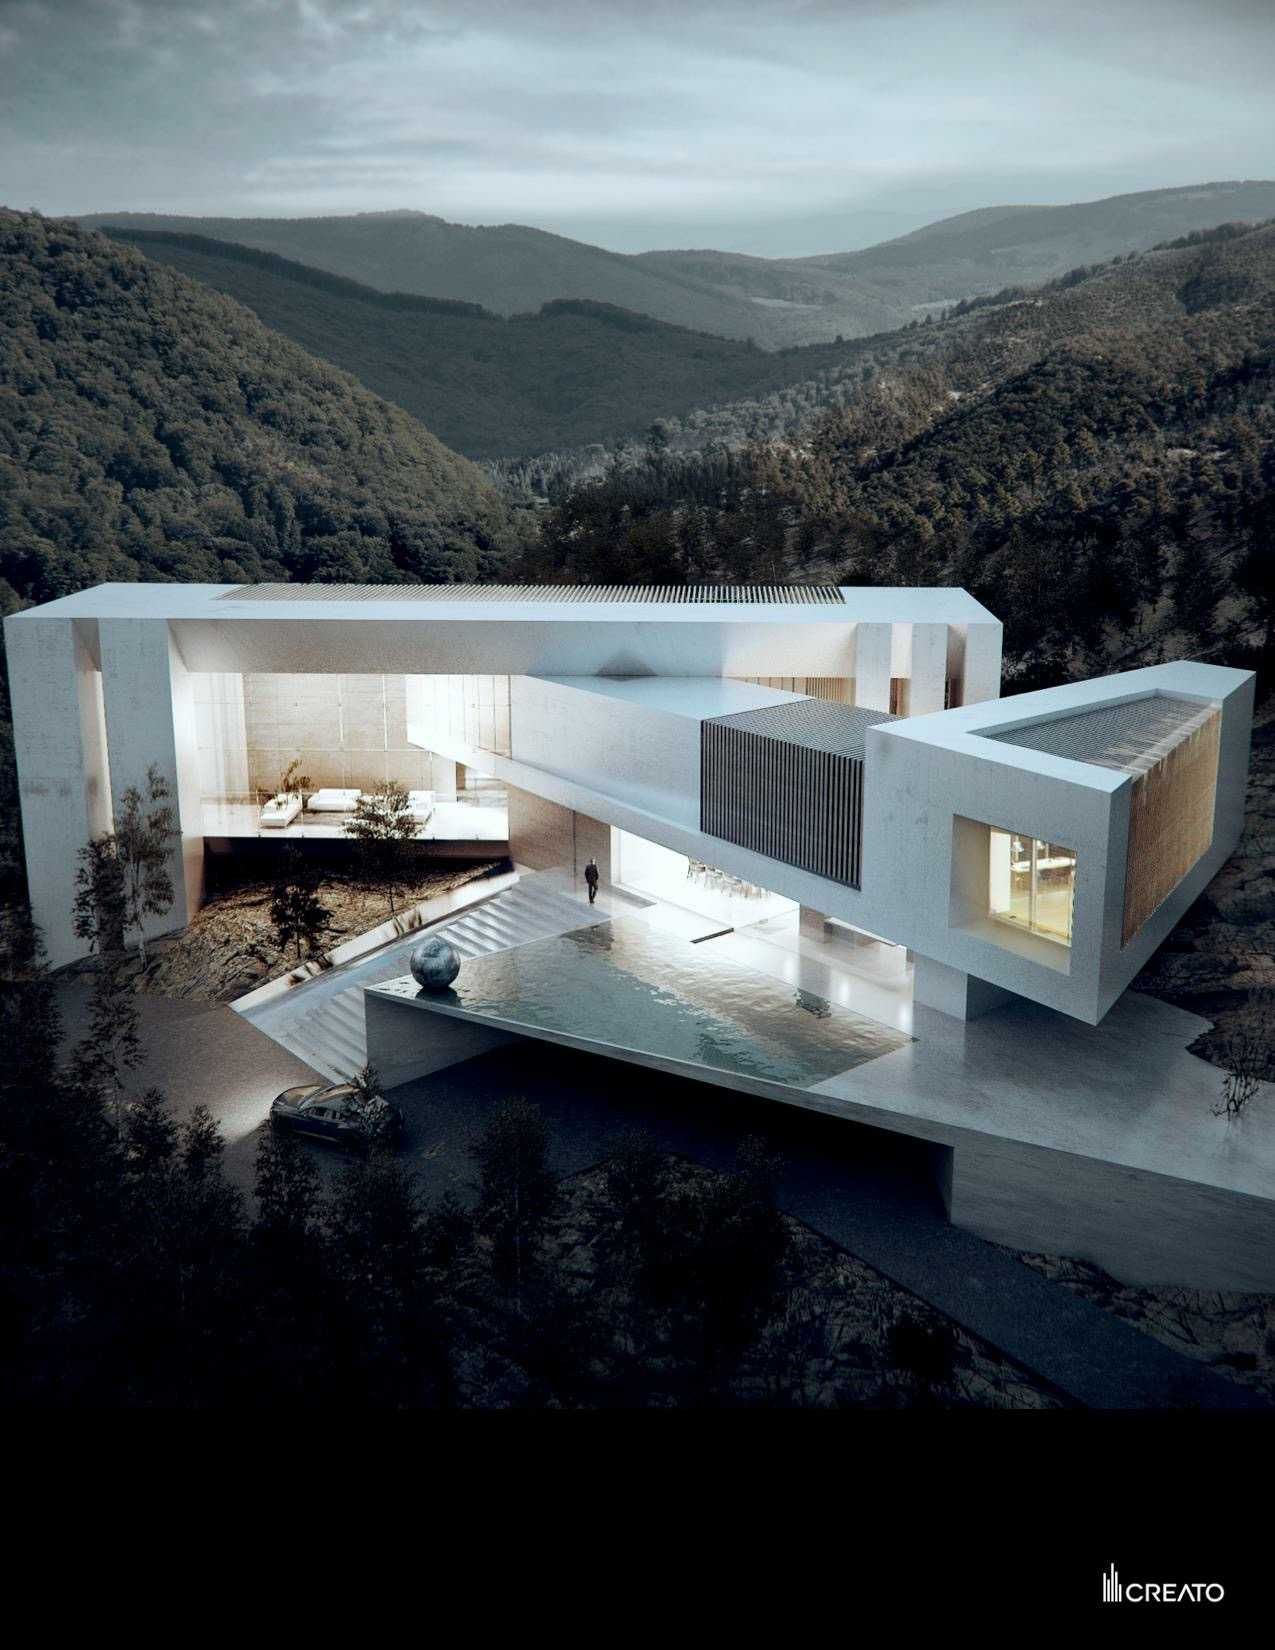 Pool House Plans Architecture Design Dream House Exterior Architecture